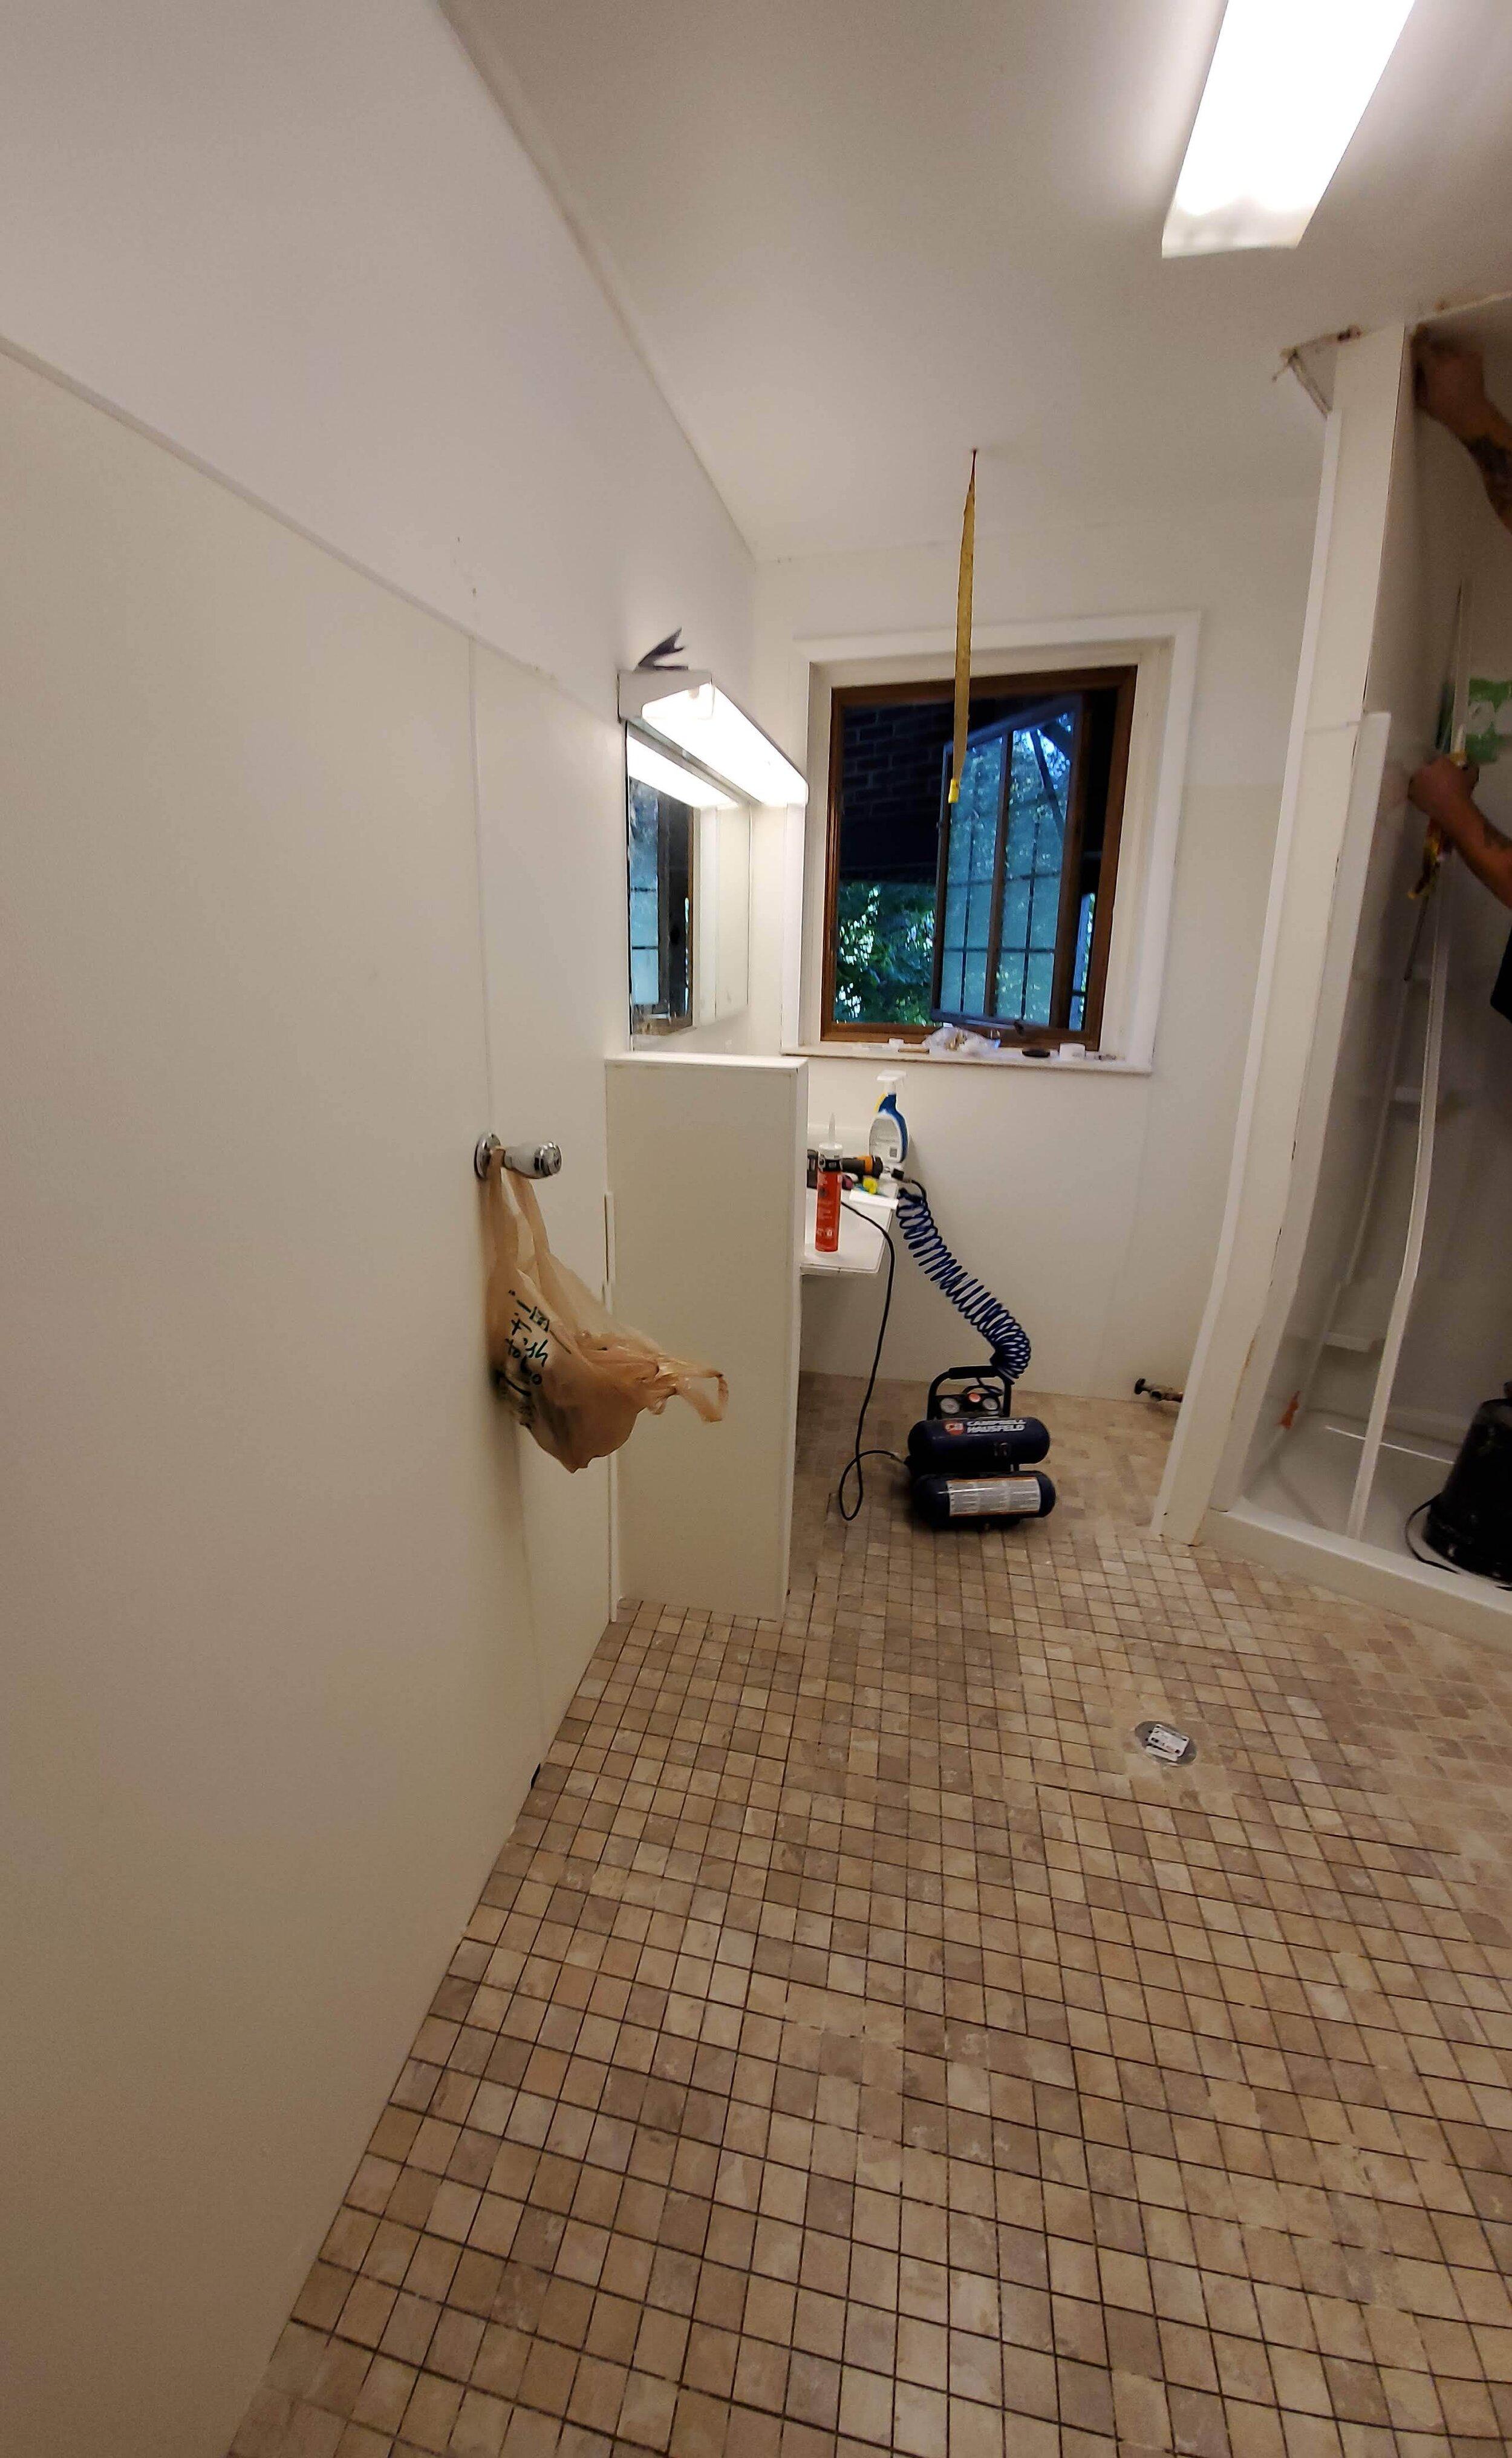 2019 First Floor Bathroom Renovation 20190815_104504.jpg